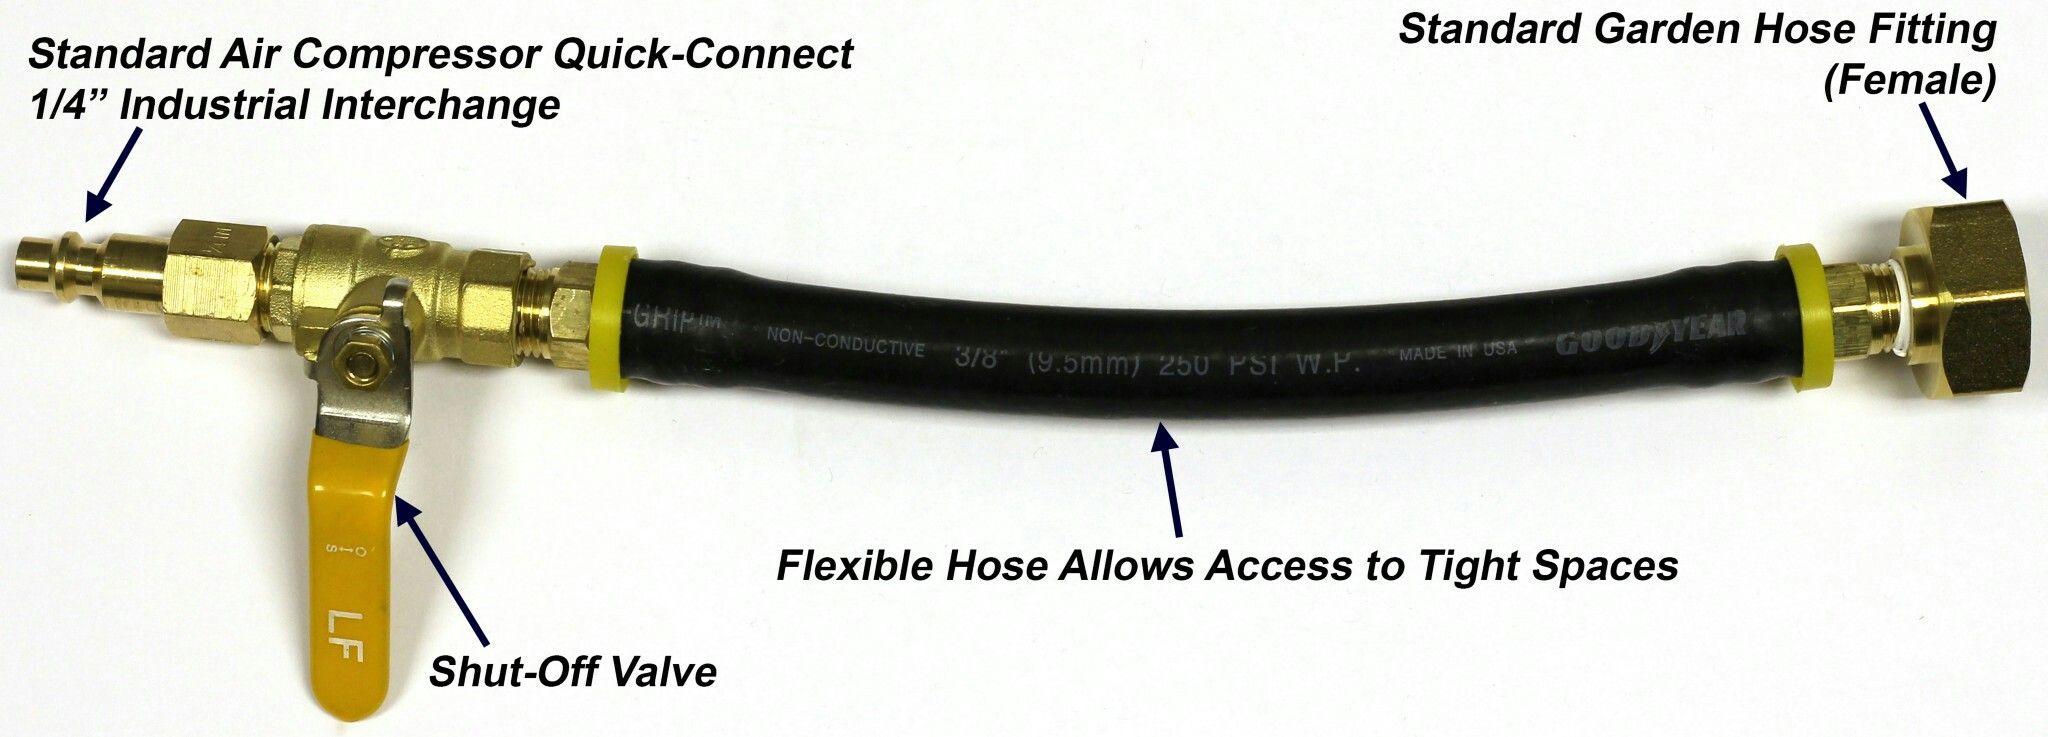 Garden hose cleanout adapter Winterize sprinkler system